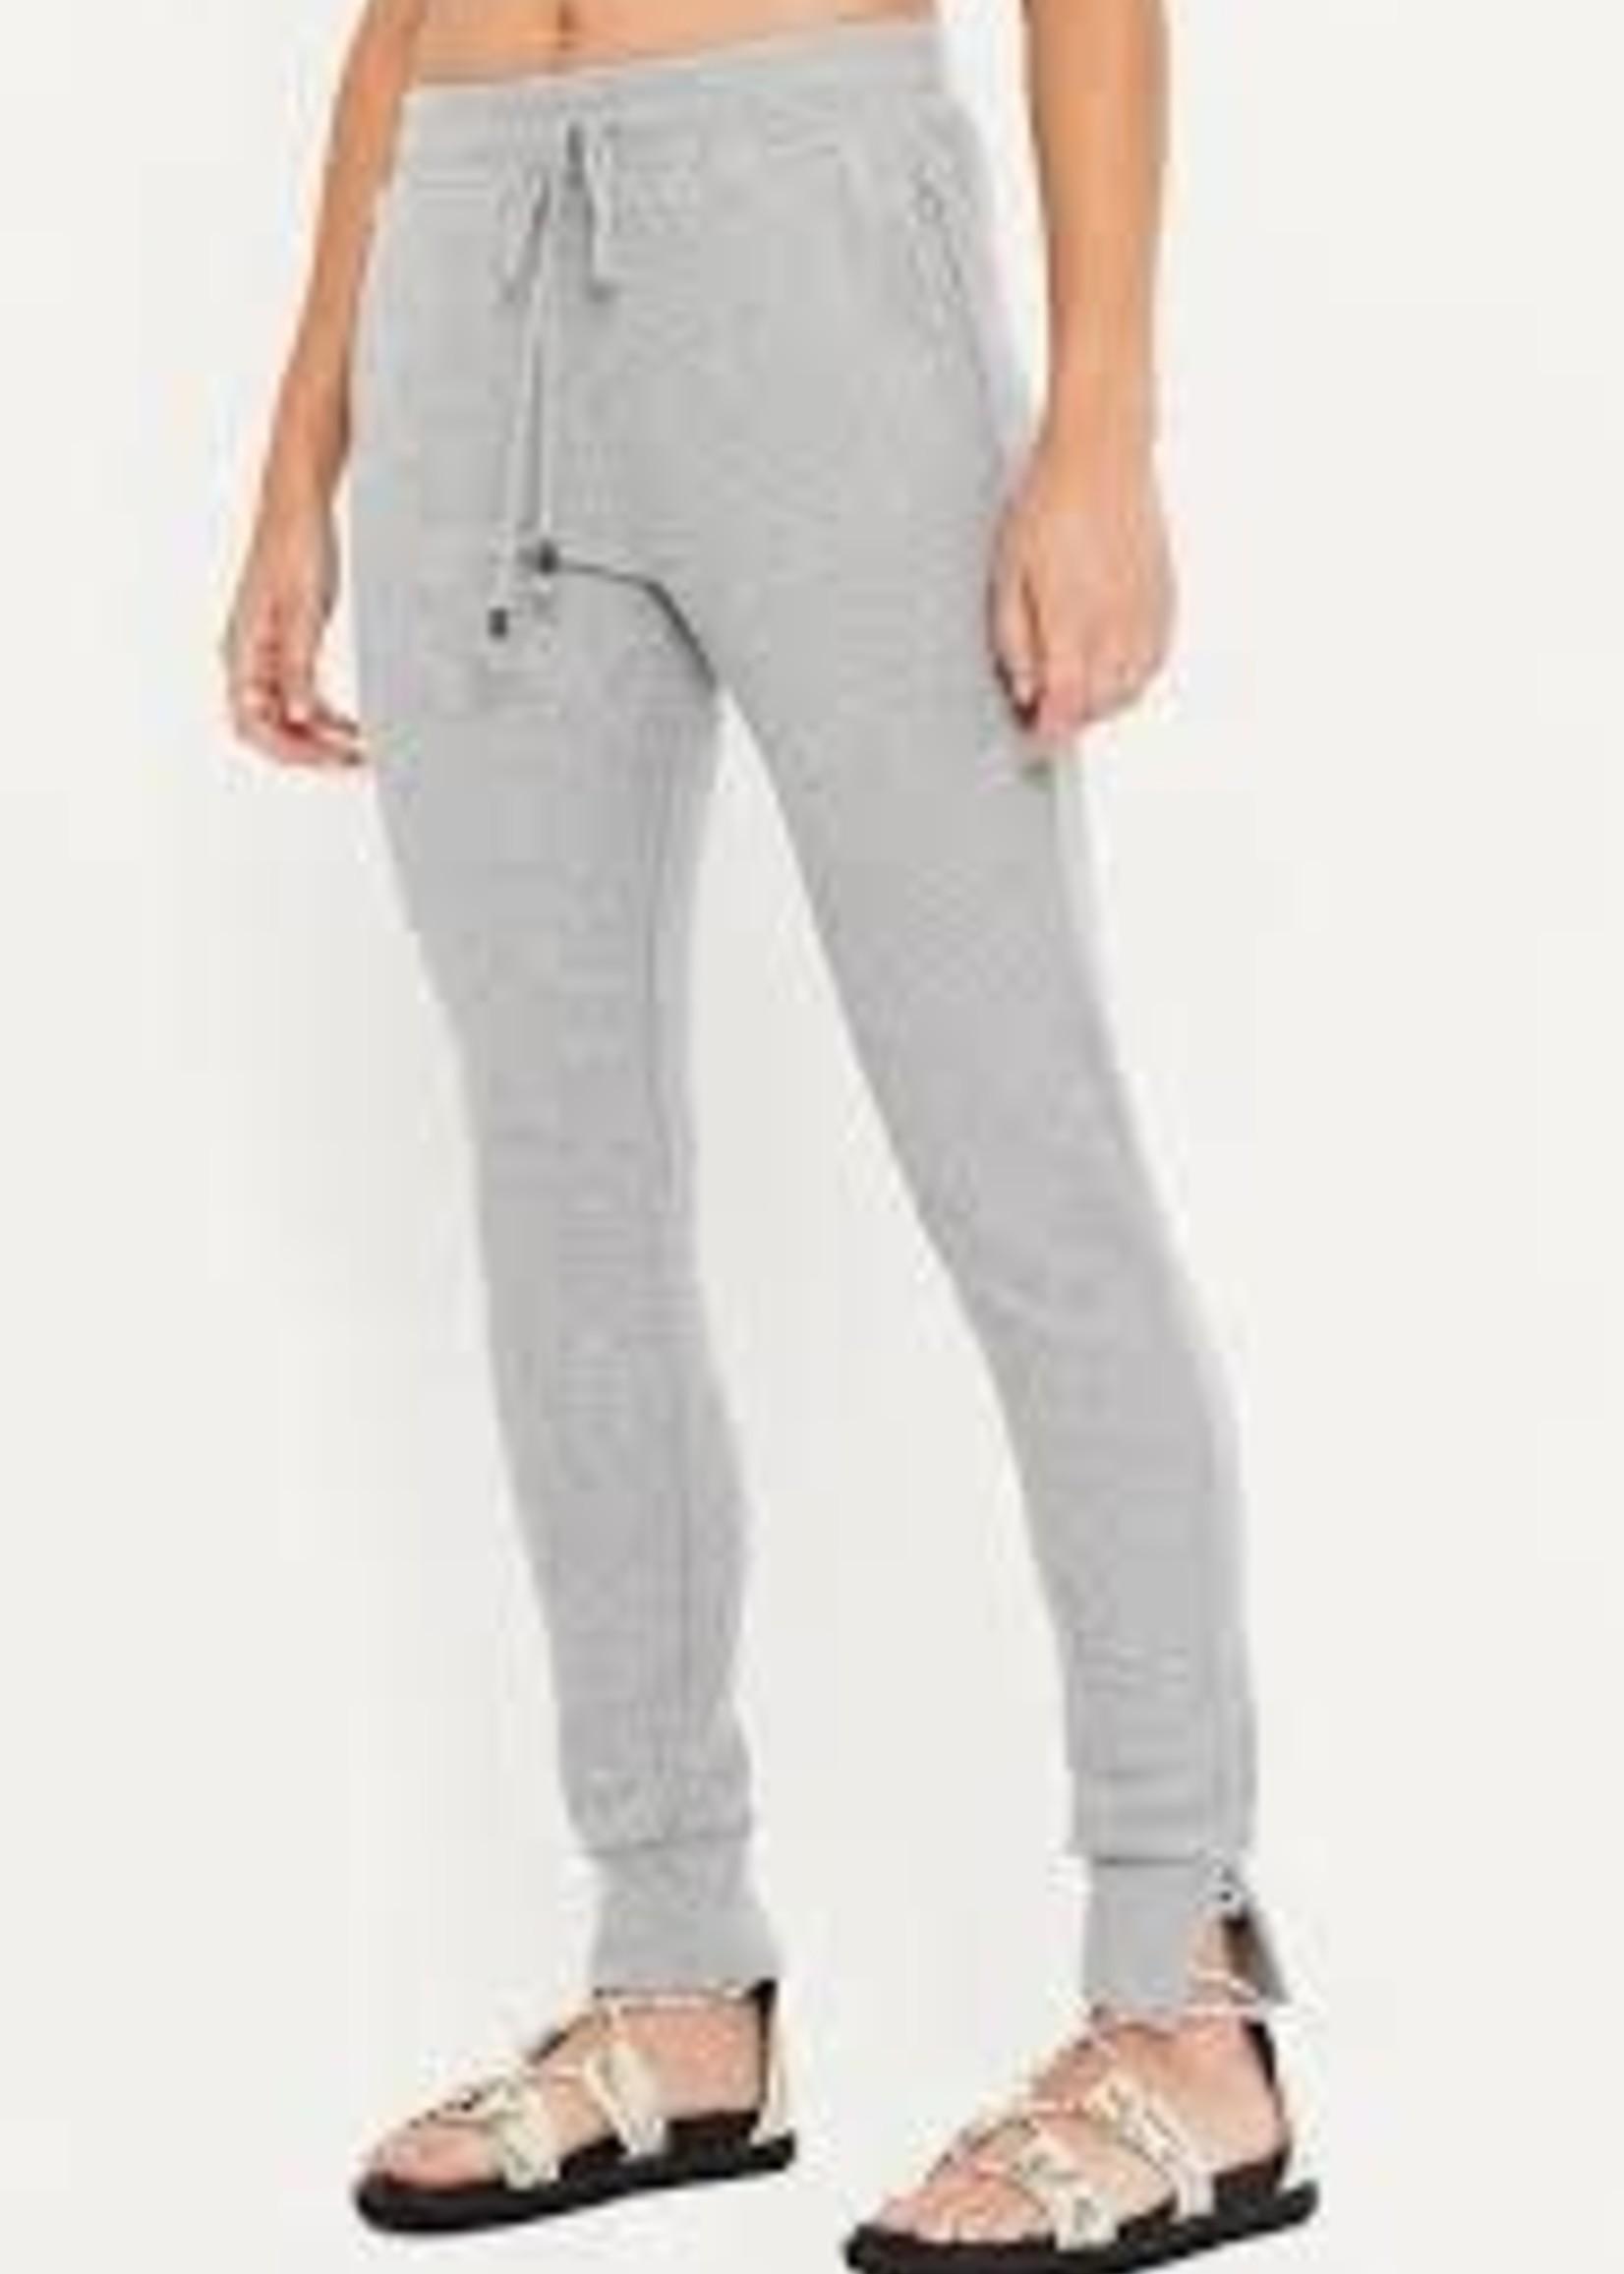 Merrow Edge Trim Pant Grey